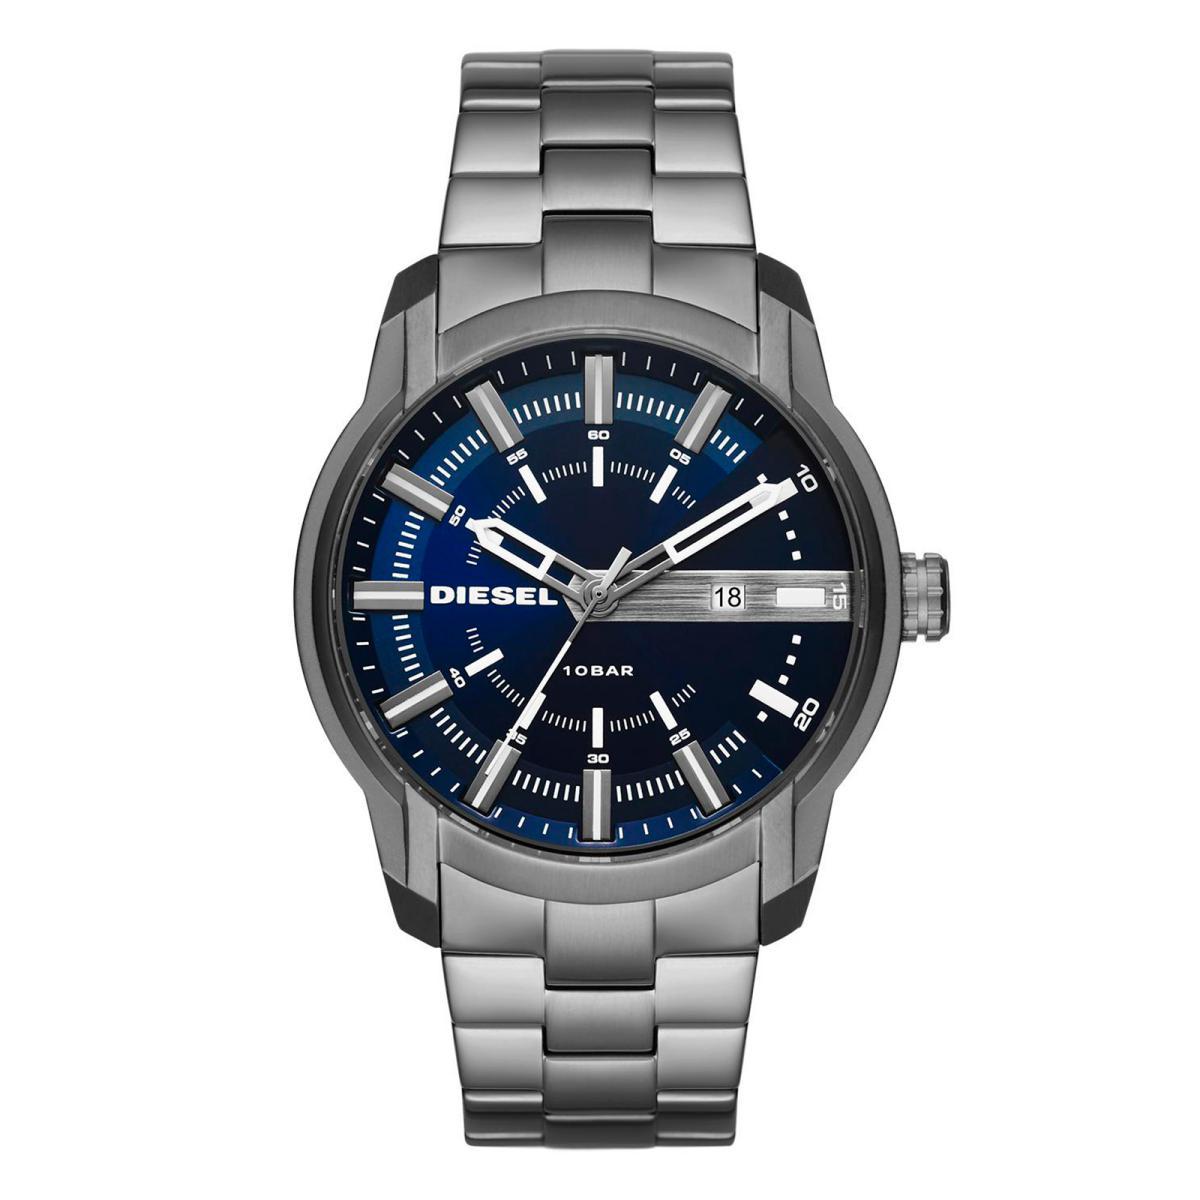 5a1ed13682d9 Reloj Diesel - DZ1768 - Hombre - Time Square